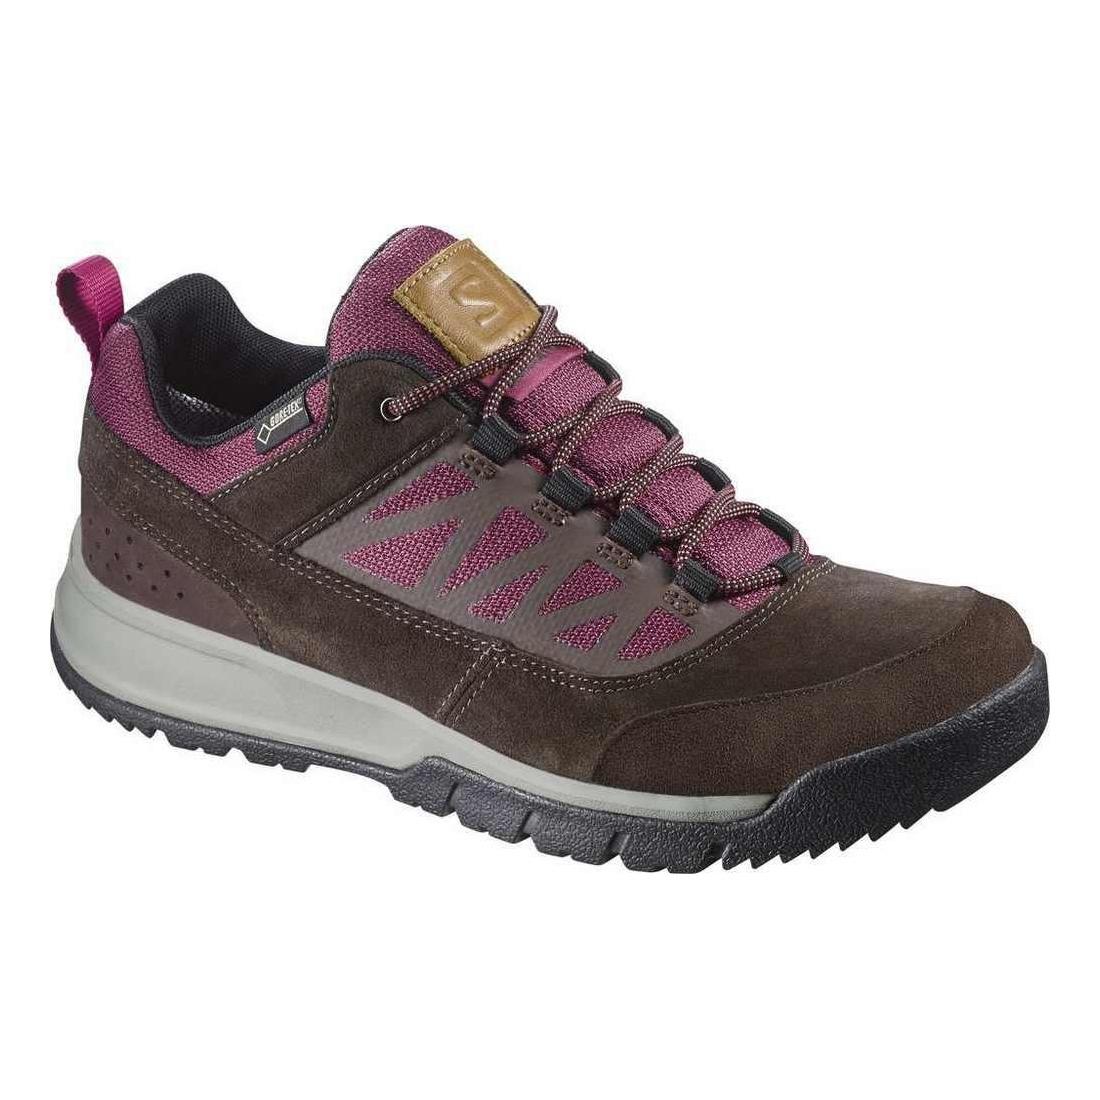 salomon instinct travel gtx walking shoes s